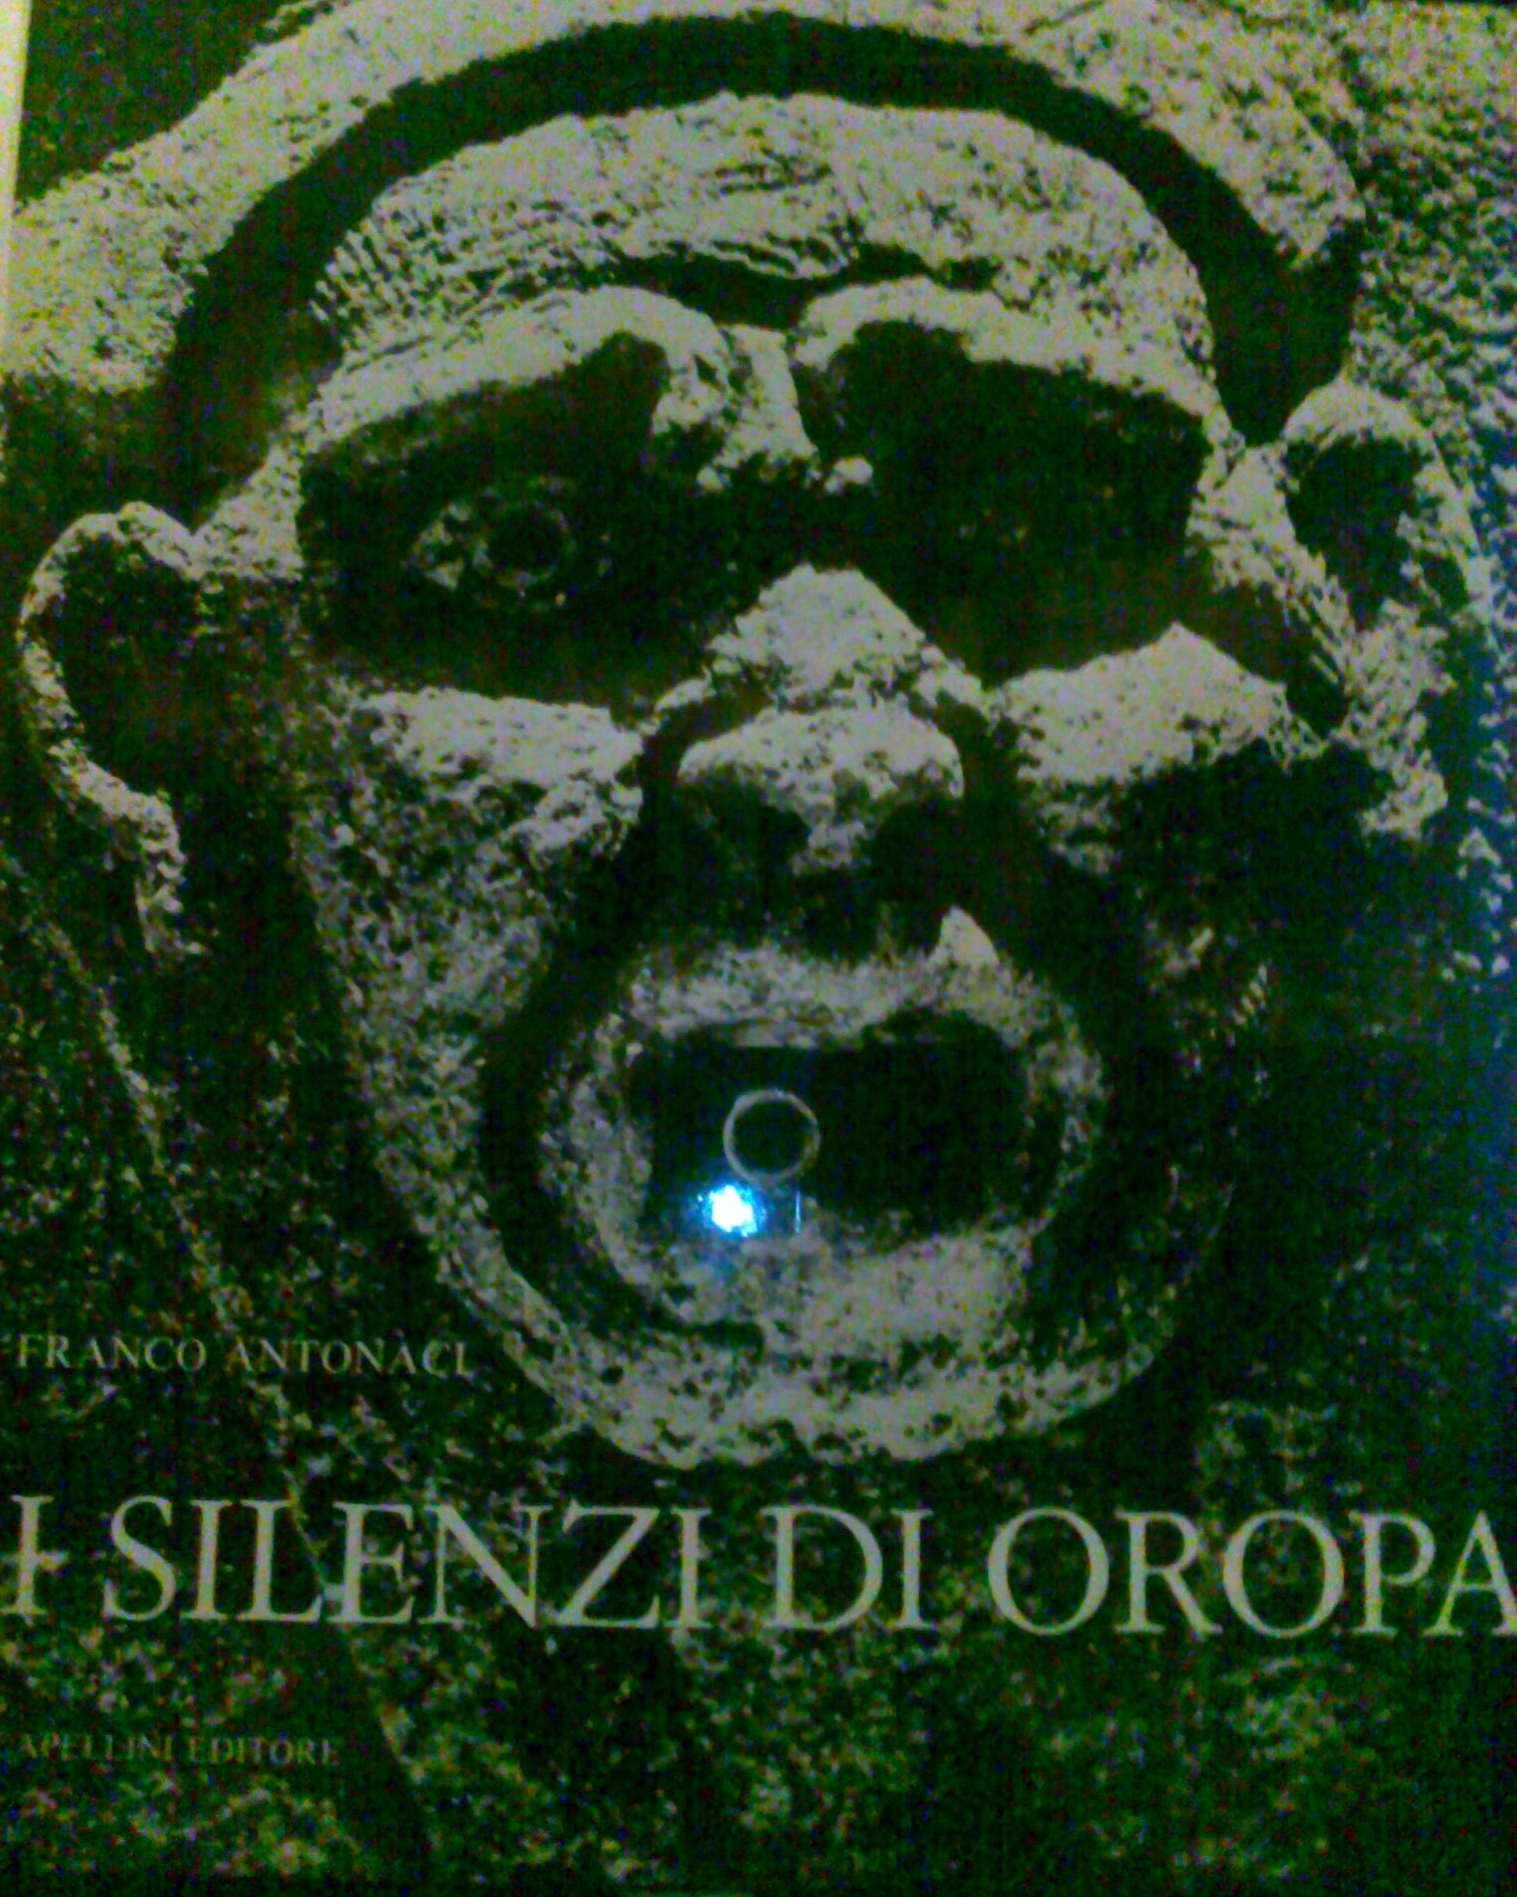 I silenzi di Oropa